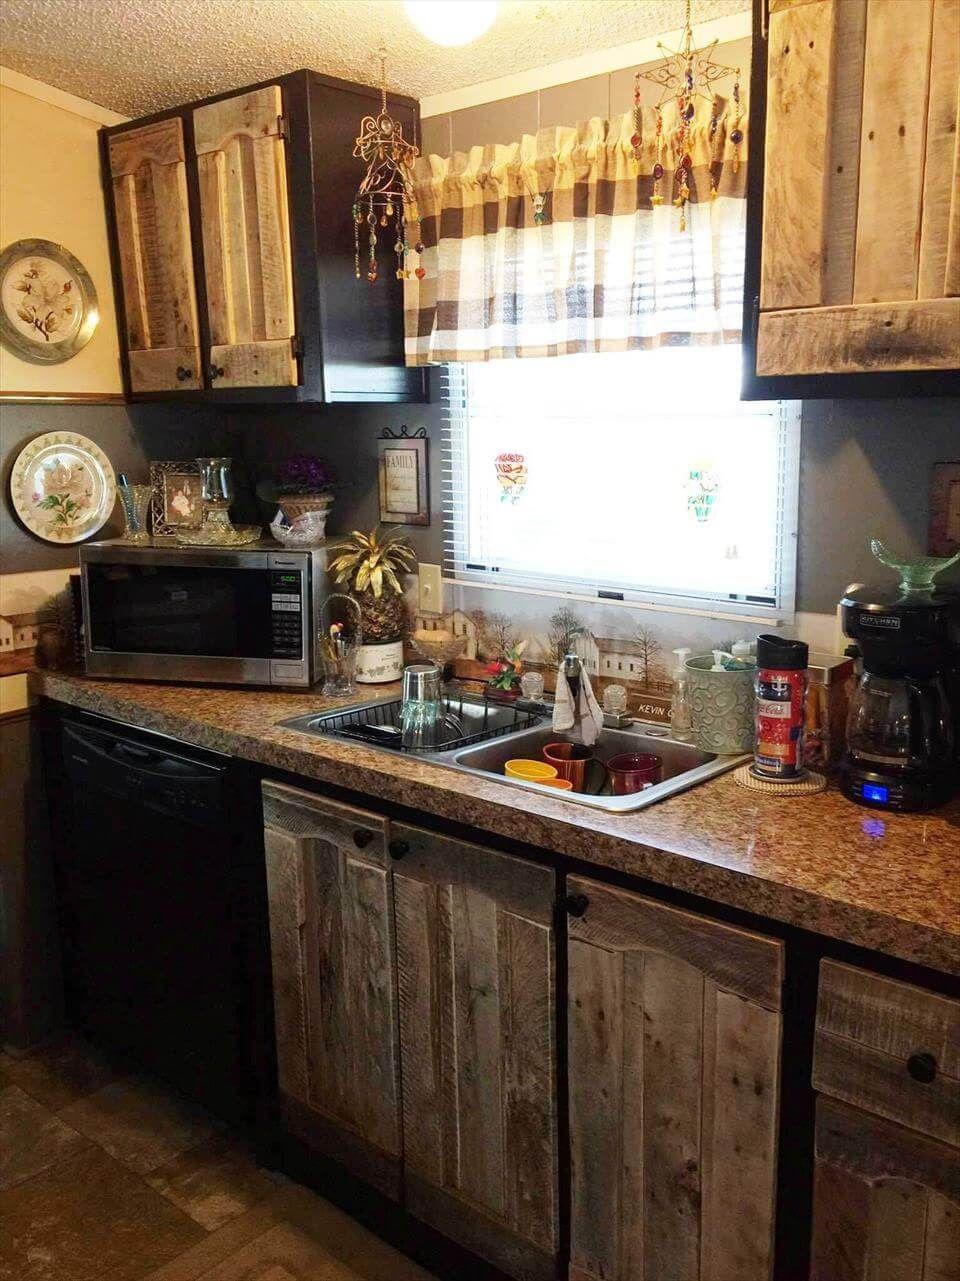 #cabinets #Easy #ideas #kitchen #Old Pallets DIY #Pallet # ...